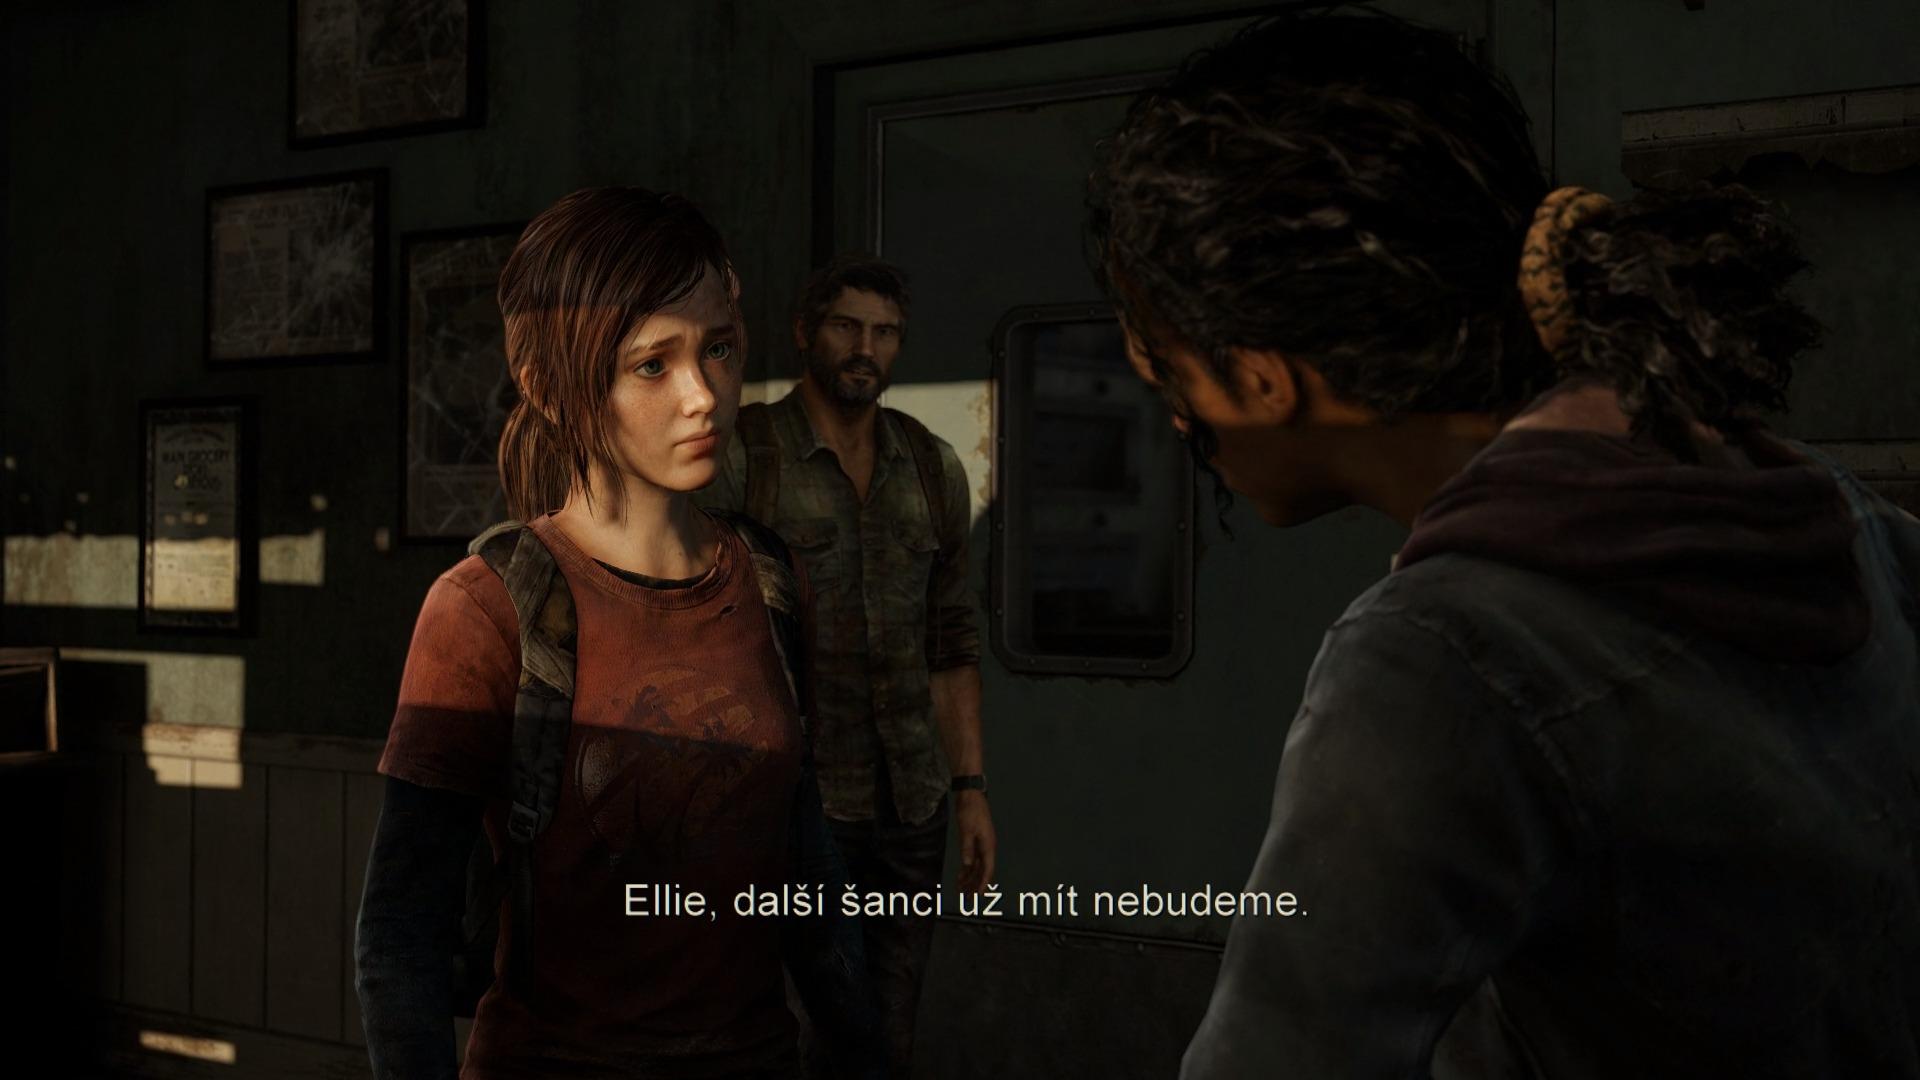 Zaostřeno na: The Last of Us Remastered 9152